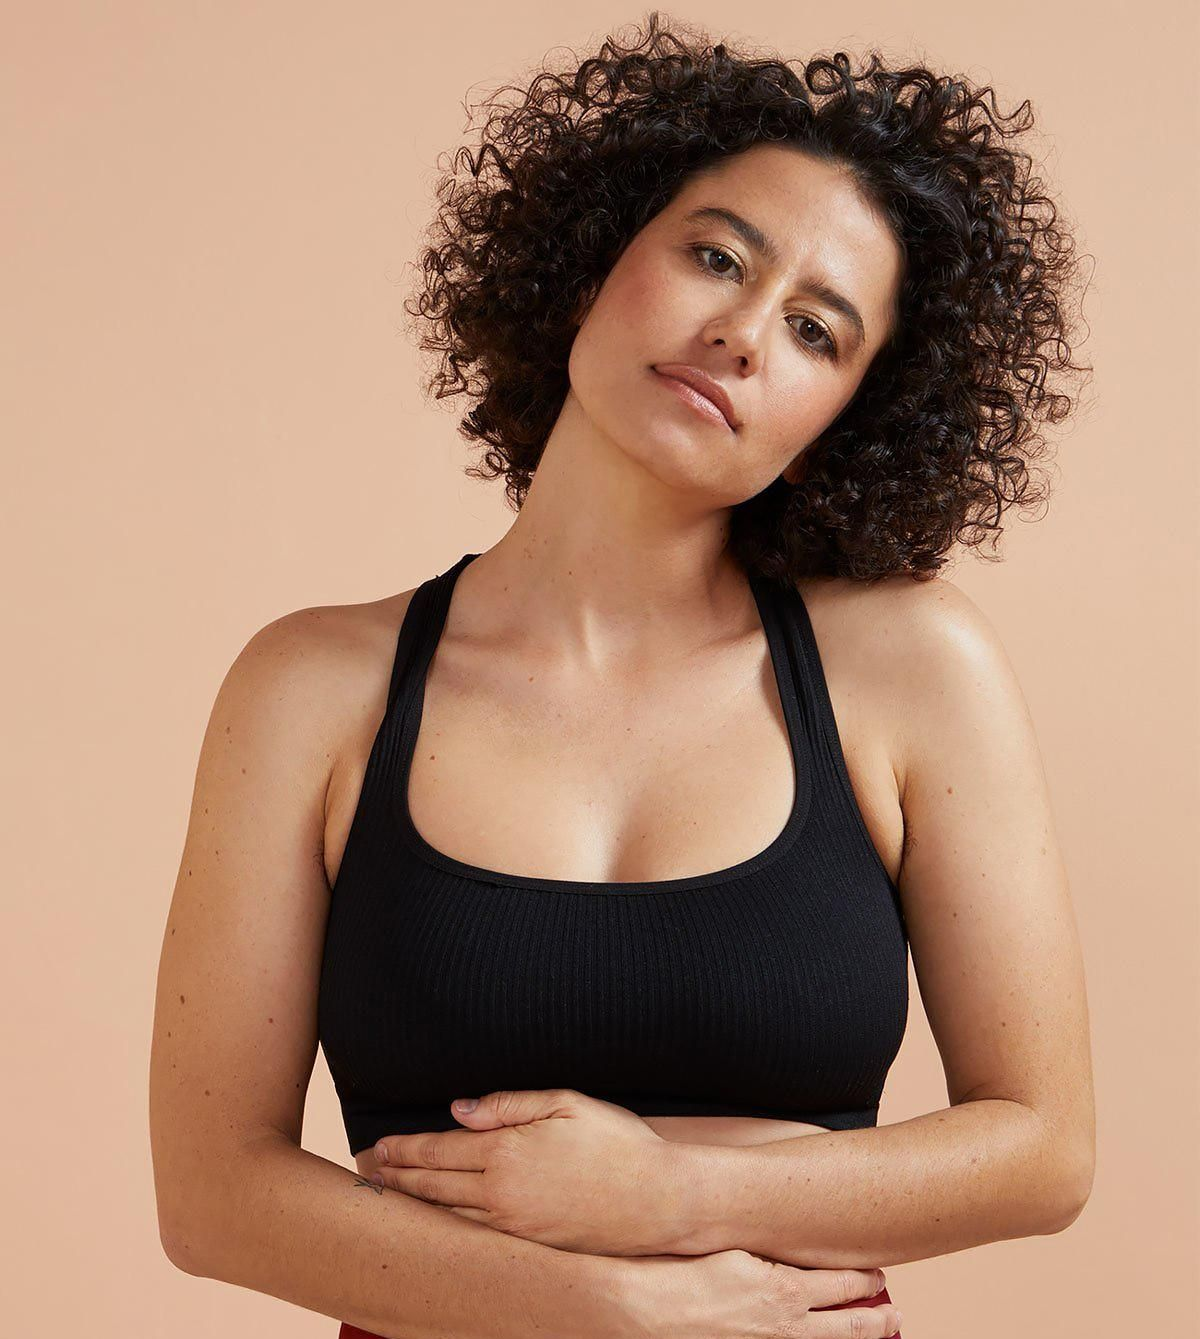 Ilana Glazer Tits Pics